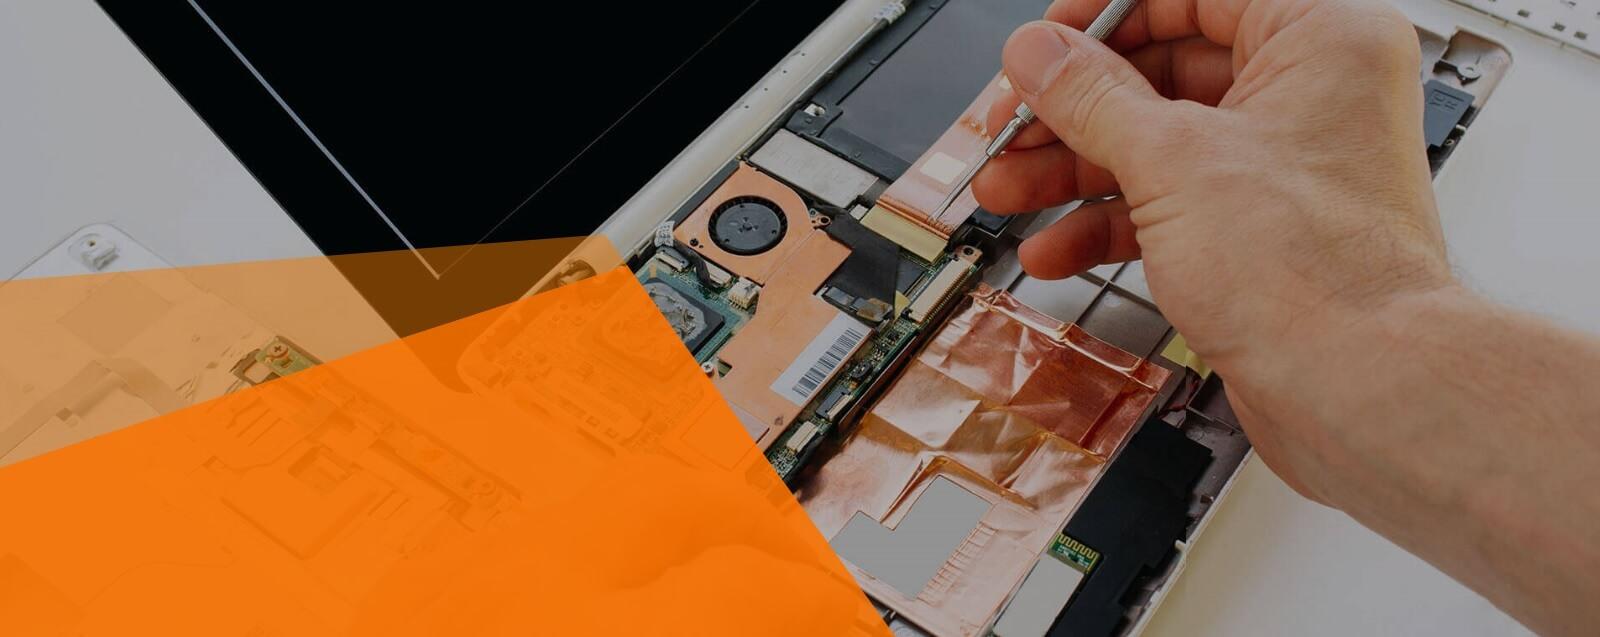 service-computer-laptop-oropos (1)